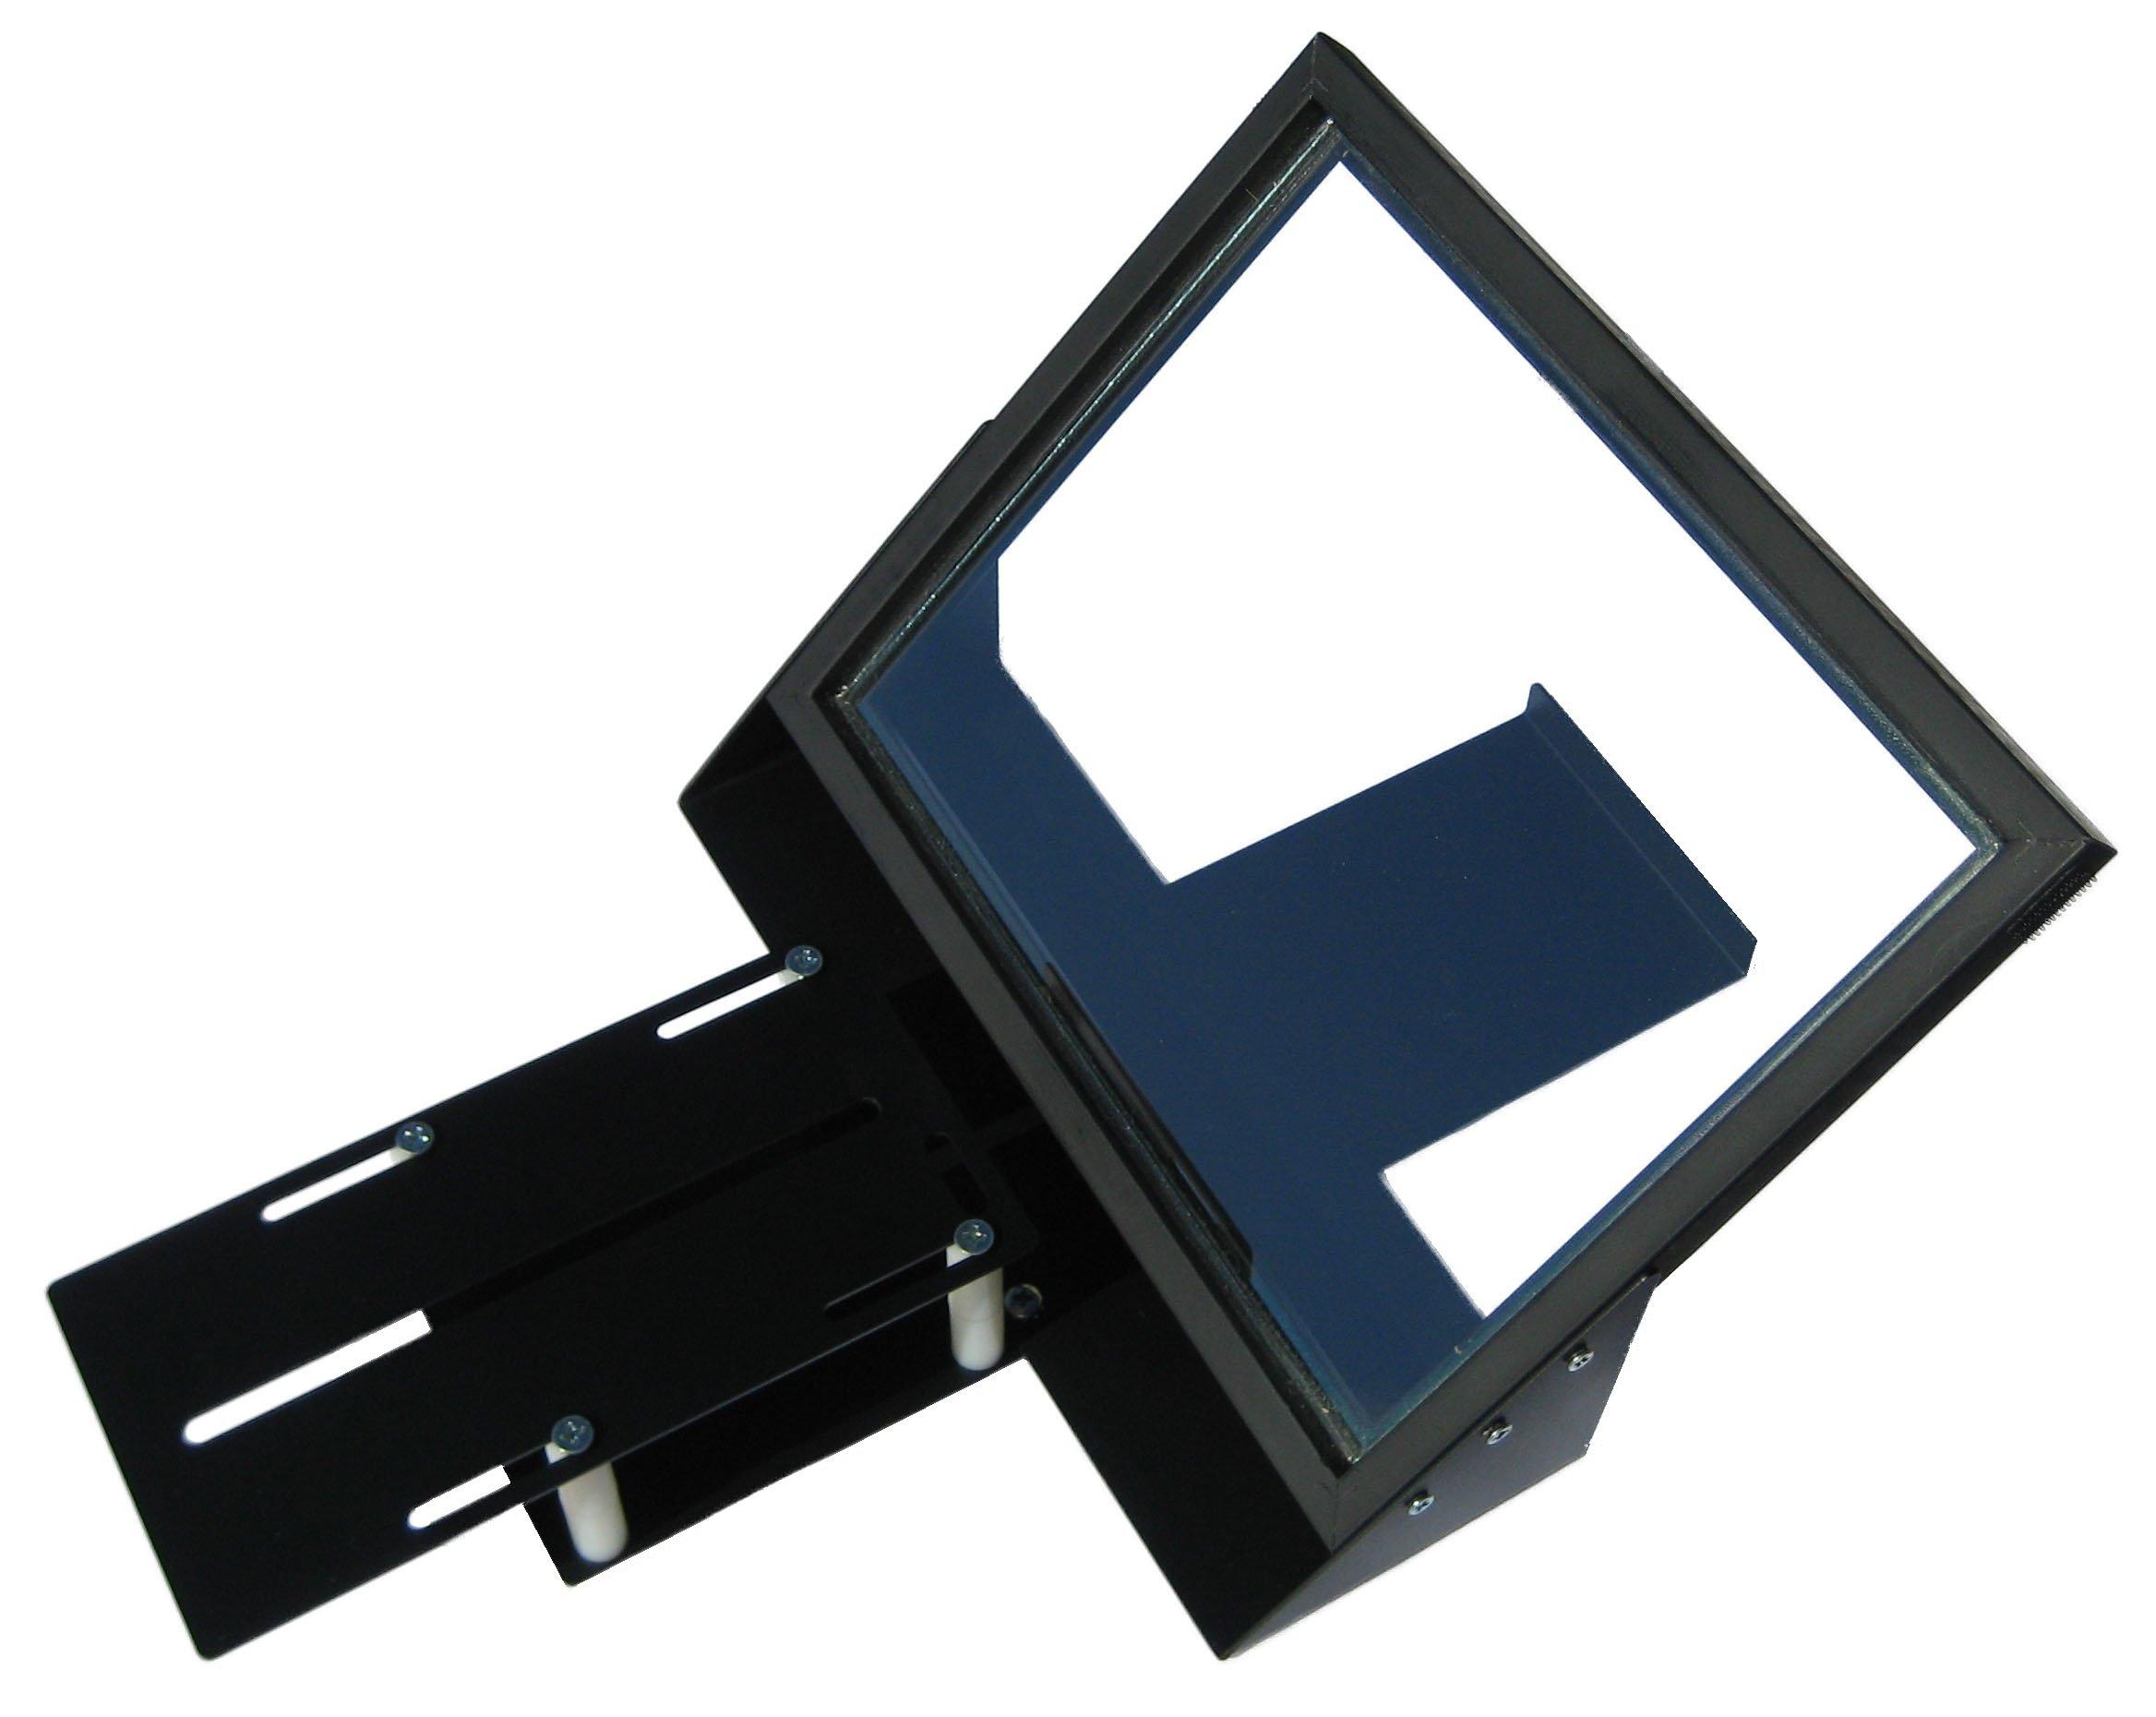 iPad iPad2 iPad3 iPad4 iPad Mini Teleprompter R810-10 with Beam Splitter Glass + Bracket to use iPhone Camera by InteractMedia